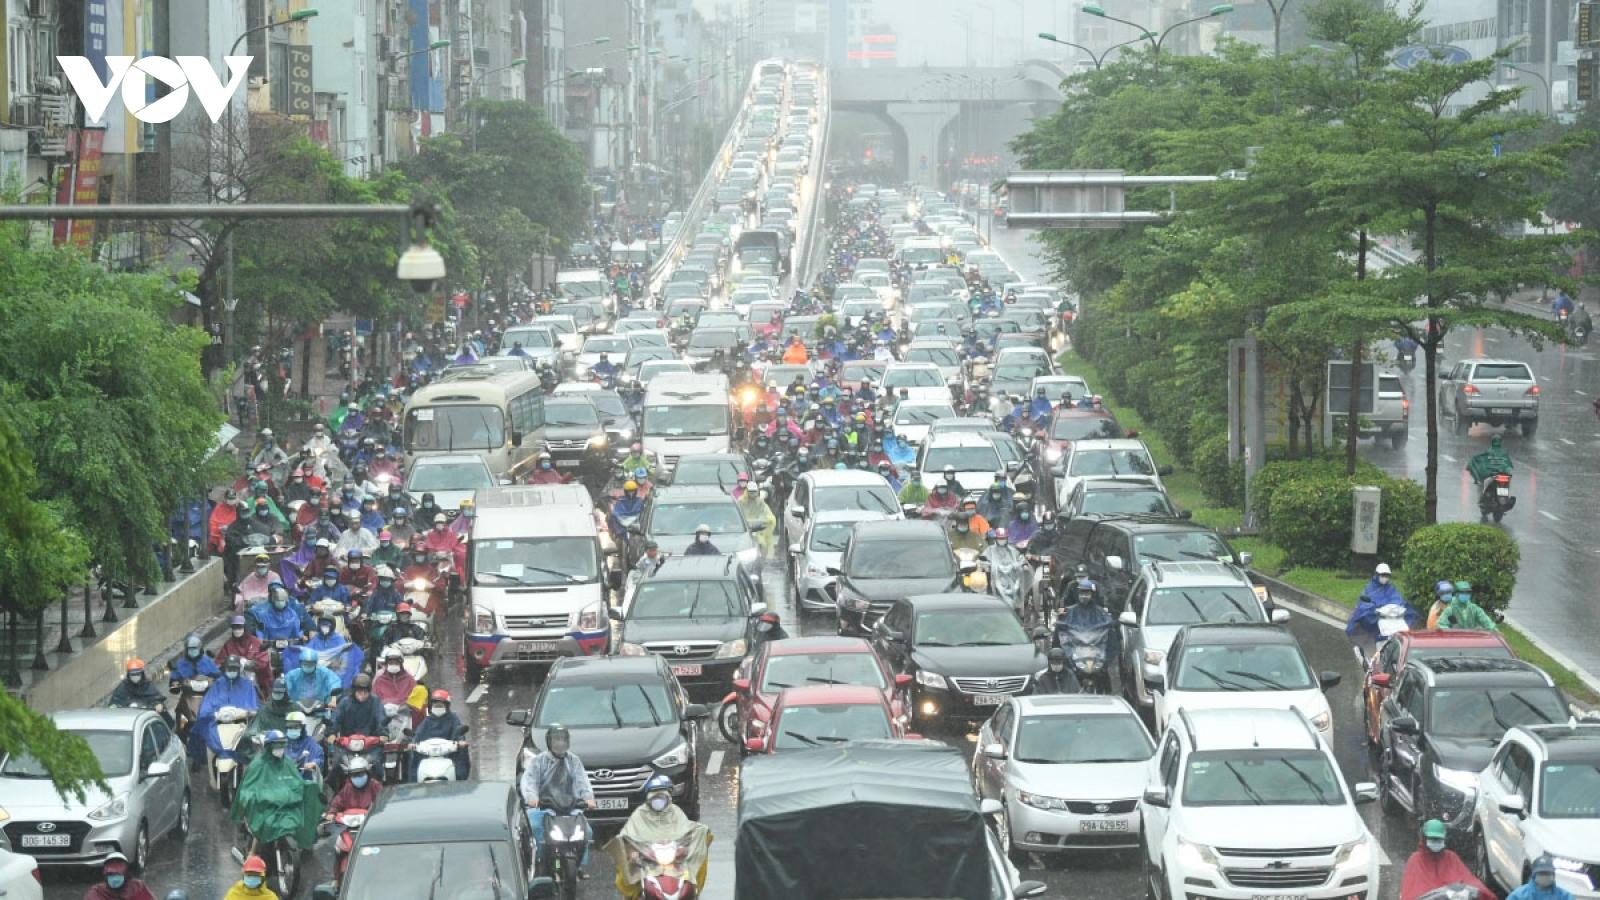 Heavy rain leaves Hanoi streets suffering traffic congestion